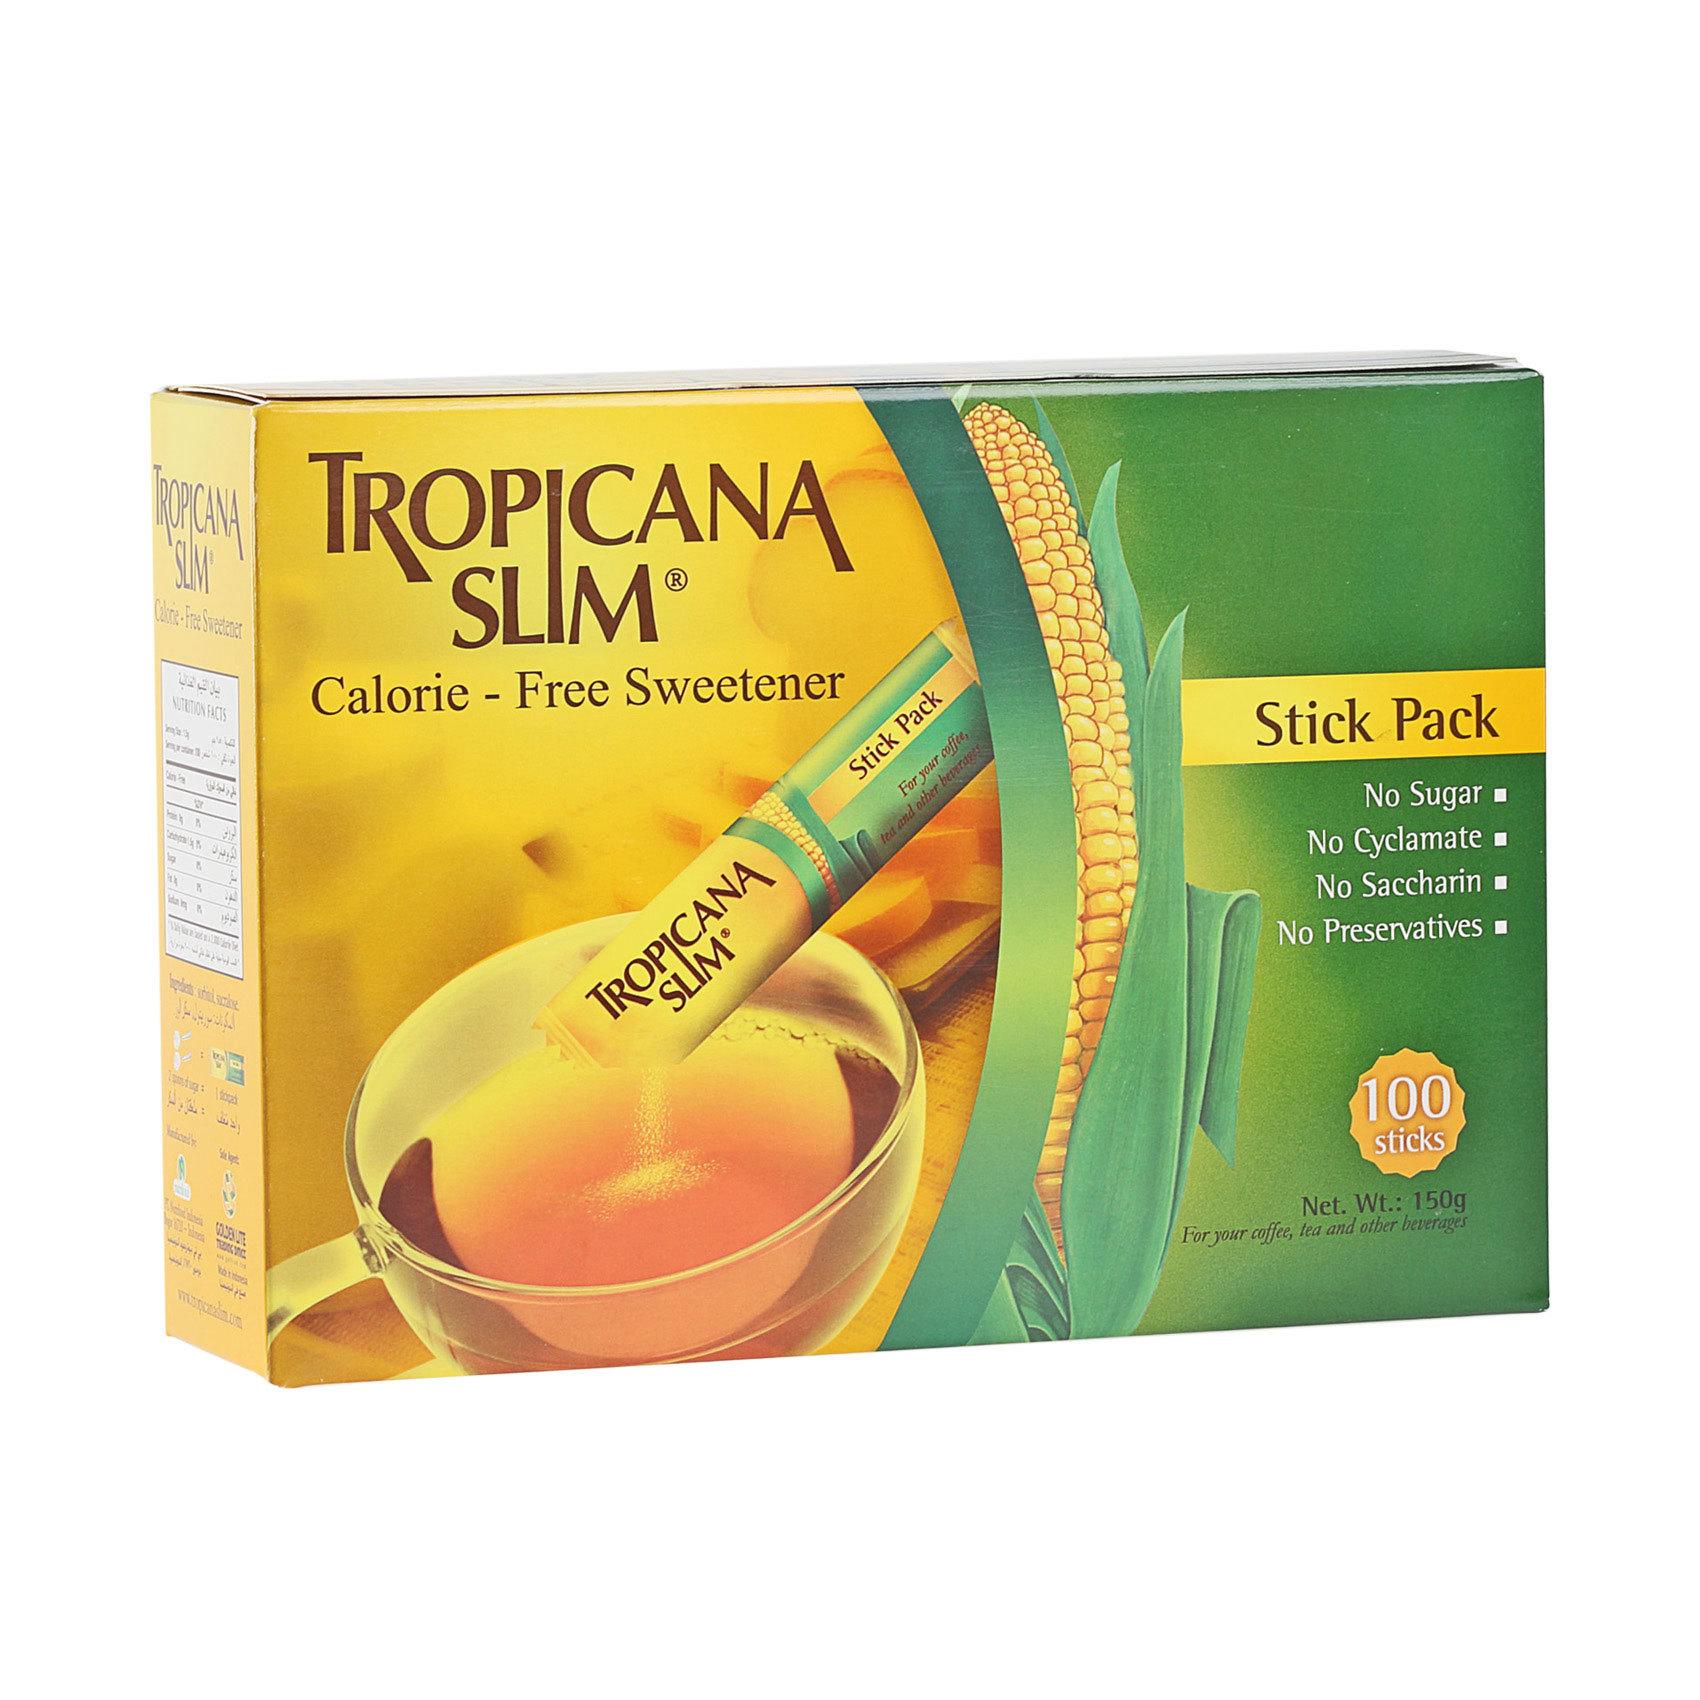 TROPICANA SLIM SWEET 0.CLR 150G